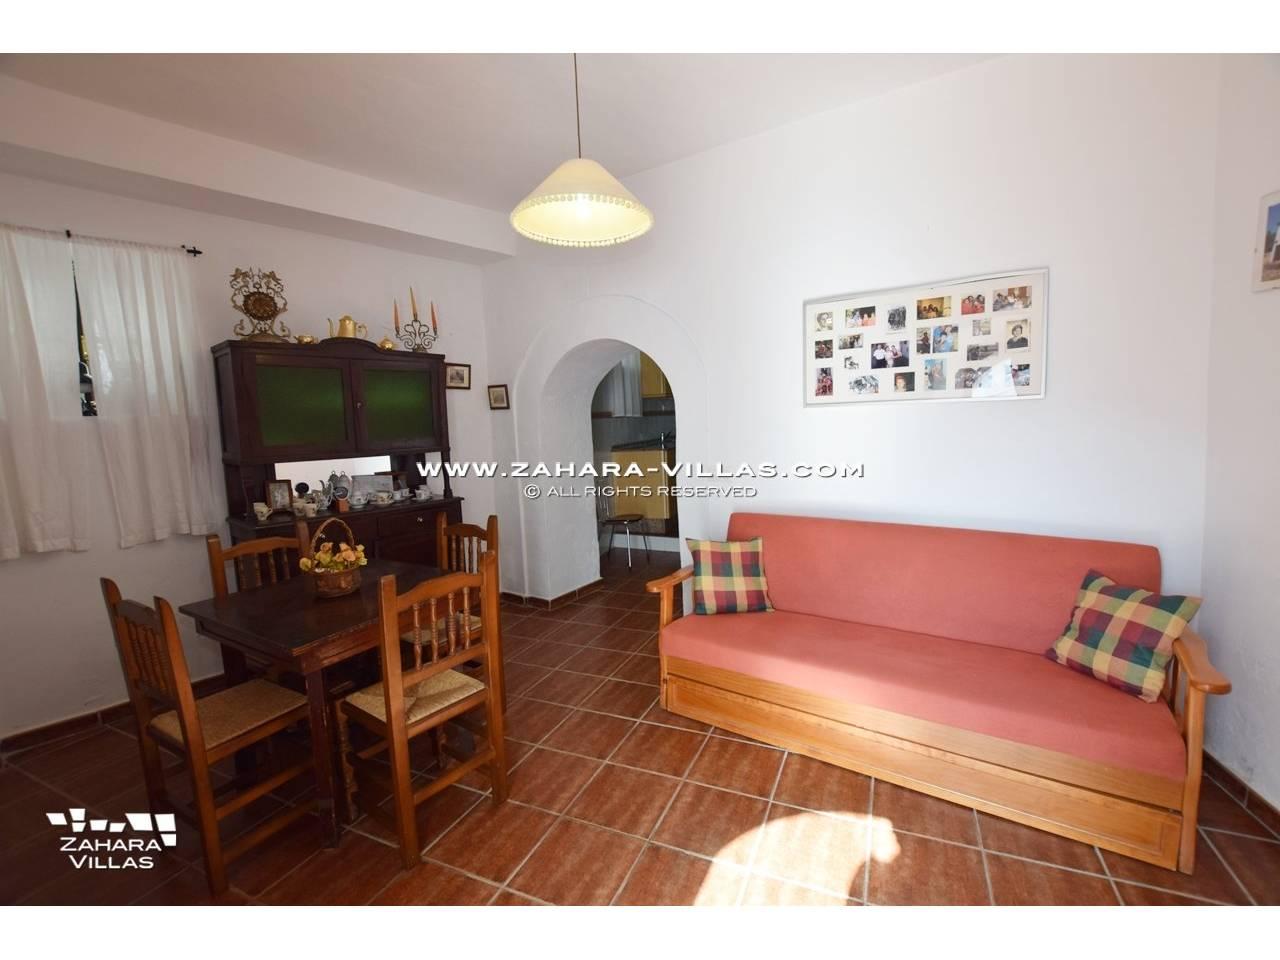 Imagen 14 de House, Apartment and Plot to build in the historic center of Vejer de la Frontera